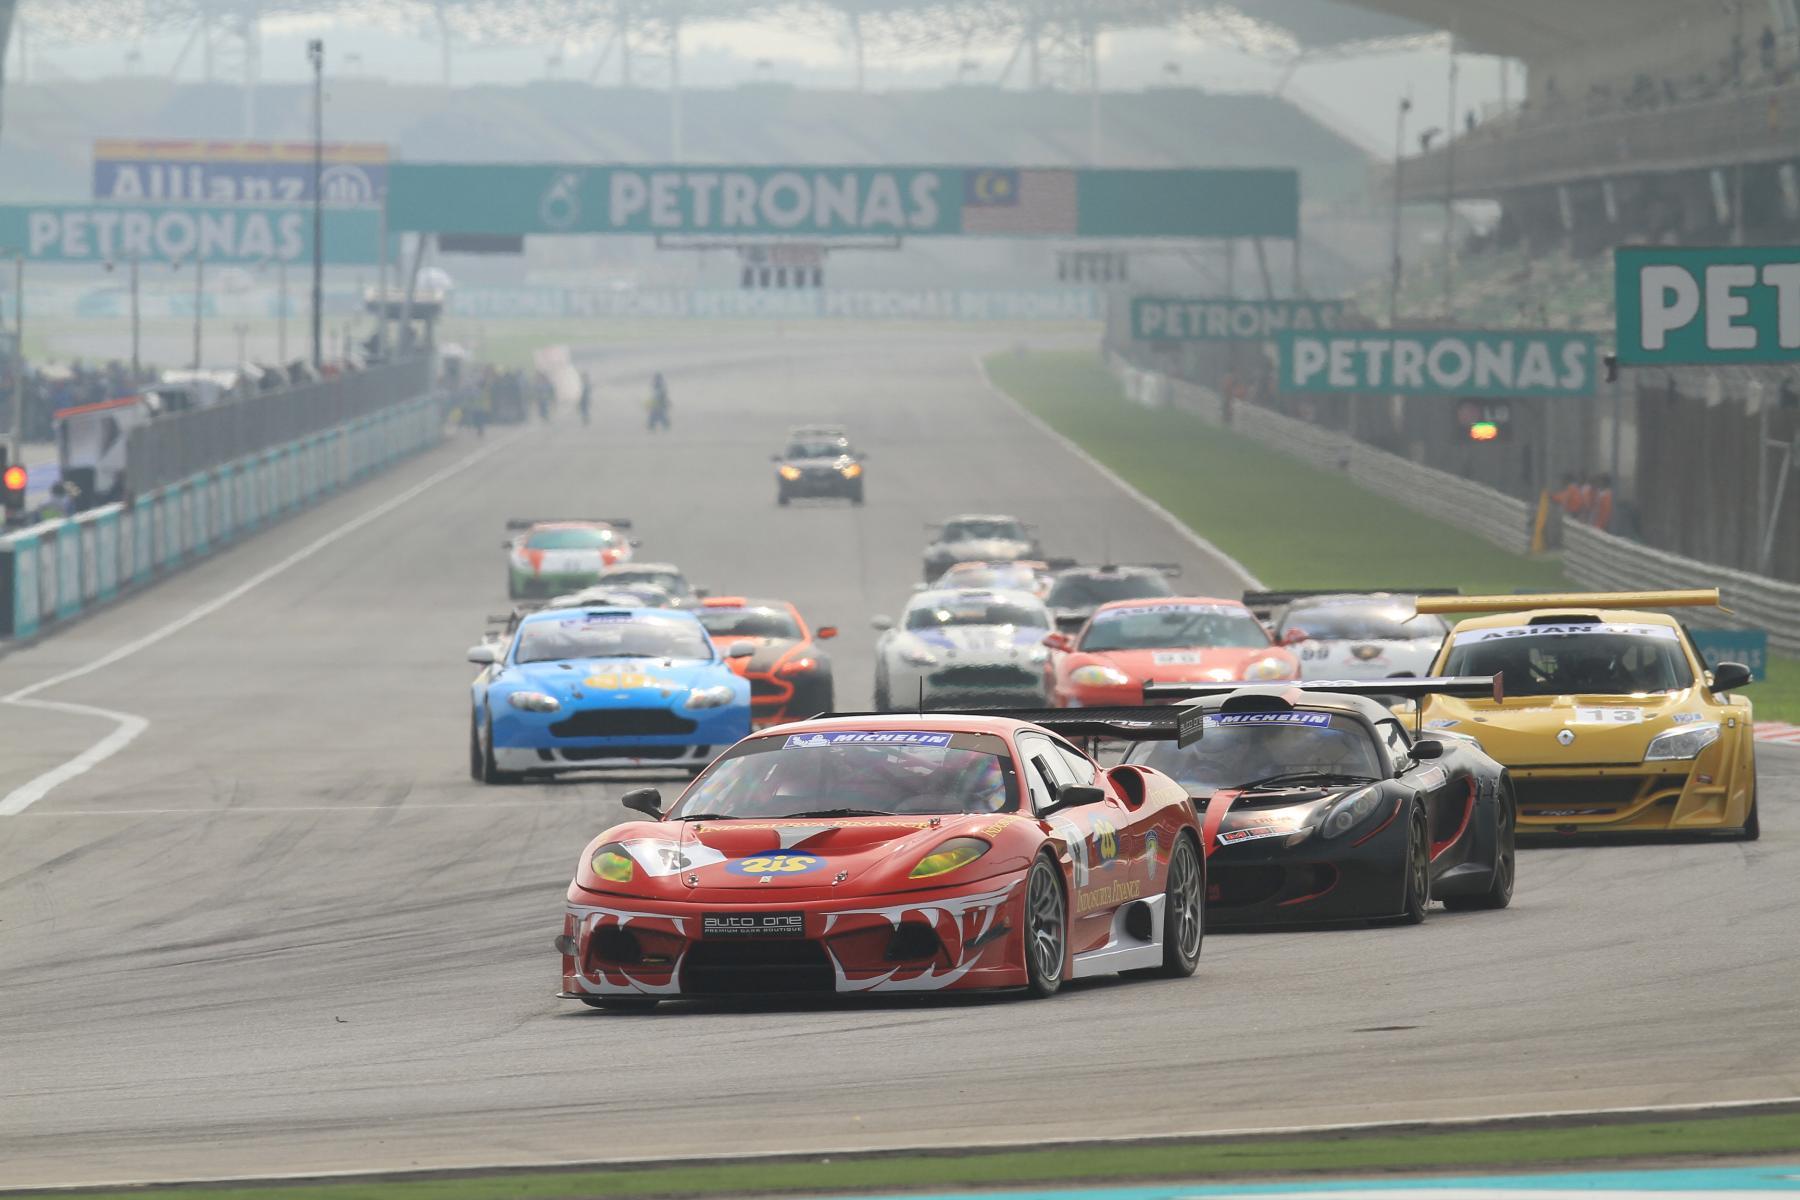 Ferrarri F430 Gt3   Race Cars for sale at Raced & Rallied   rally ...